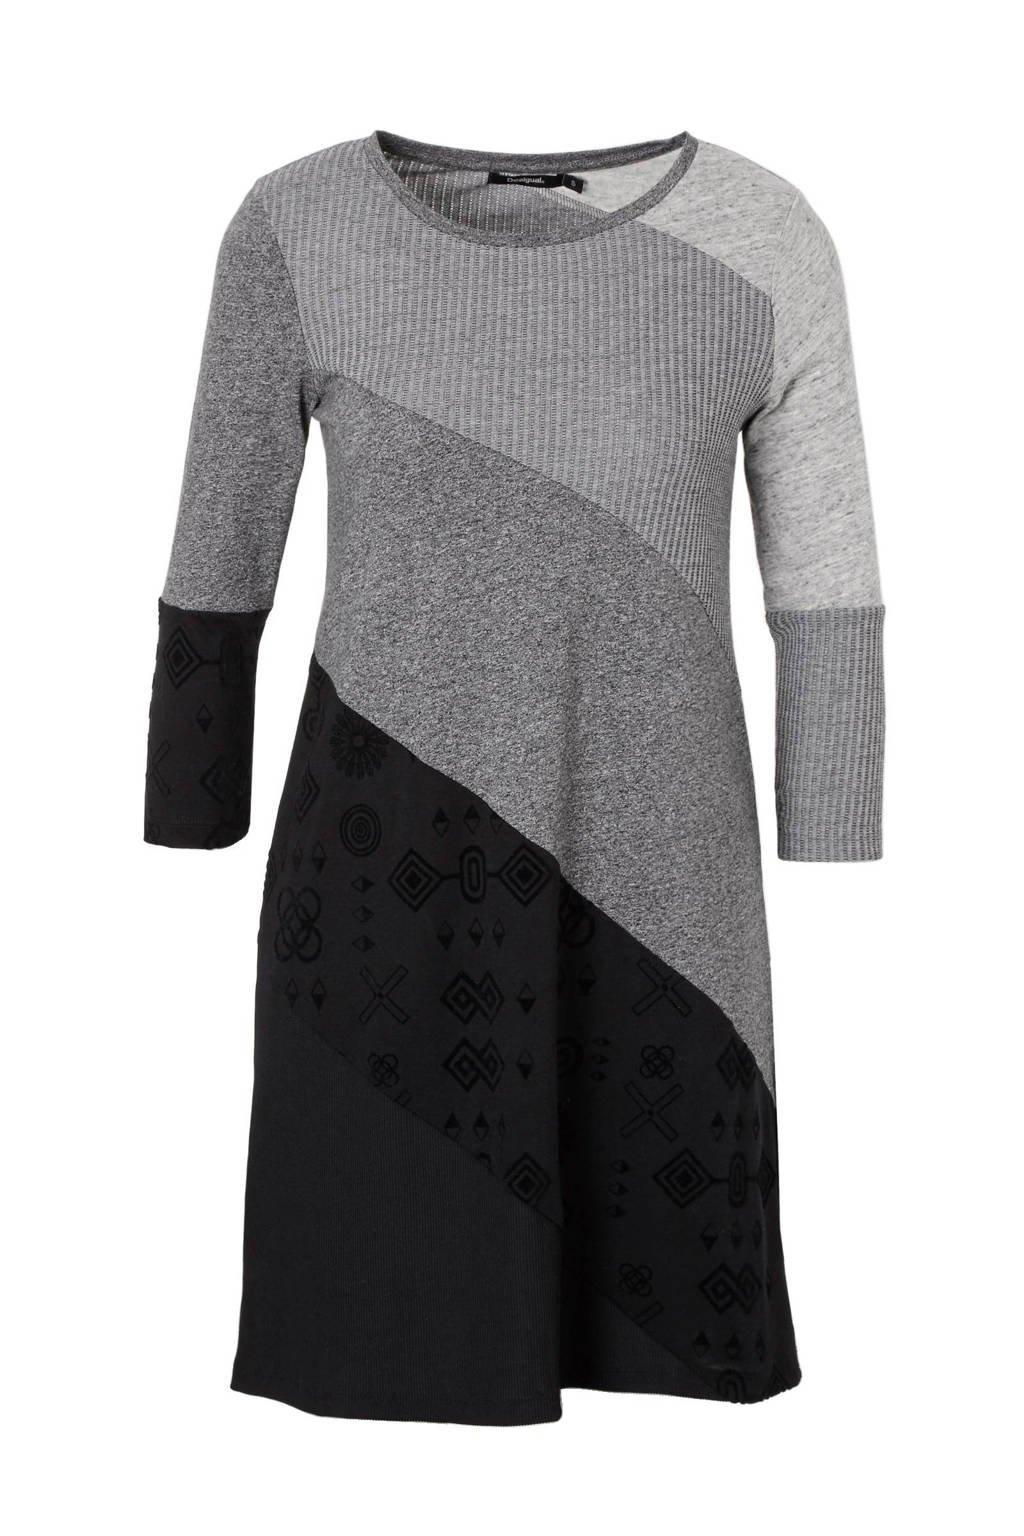 Desigual jurk, Grijs/zwart